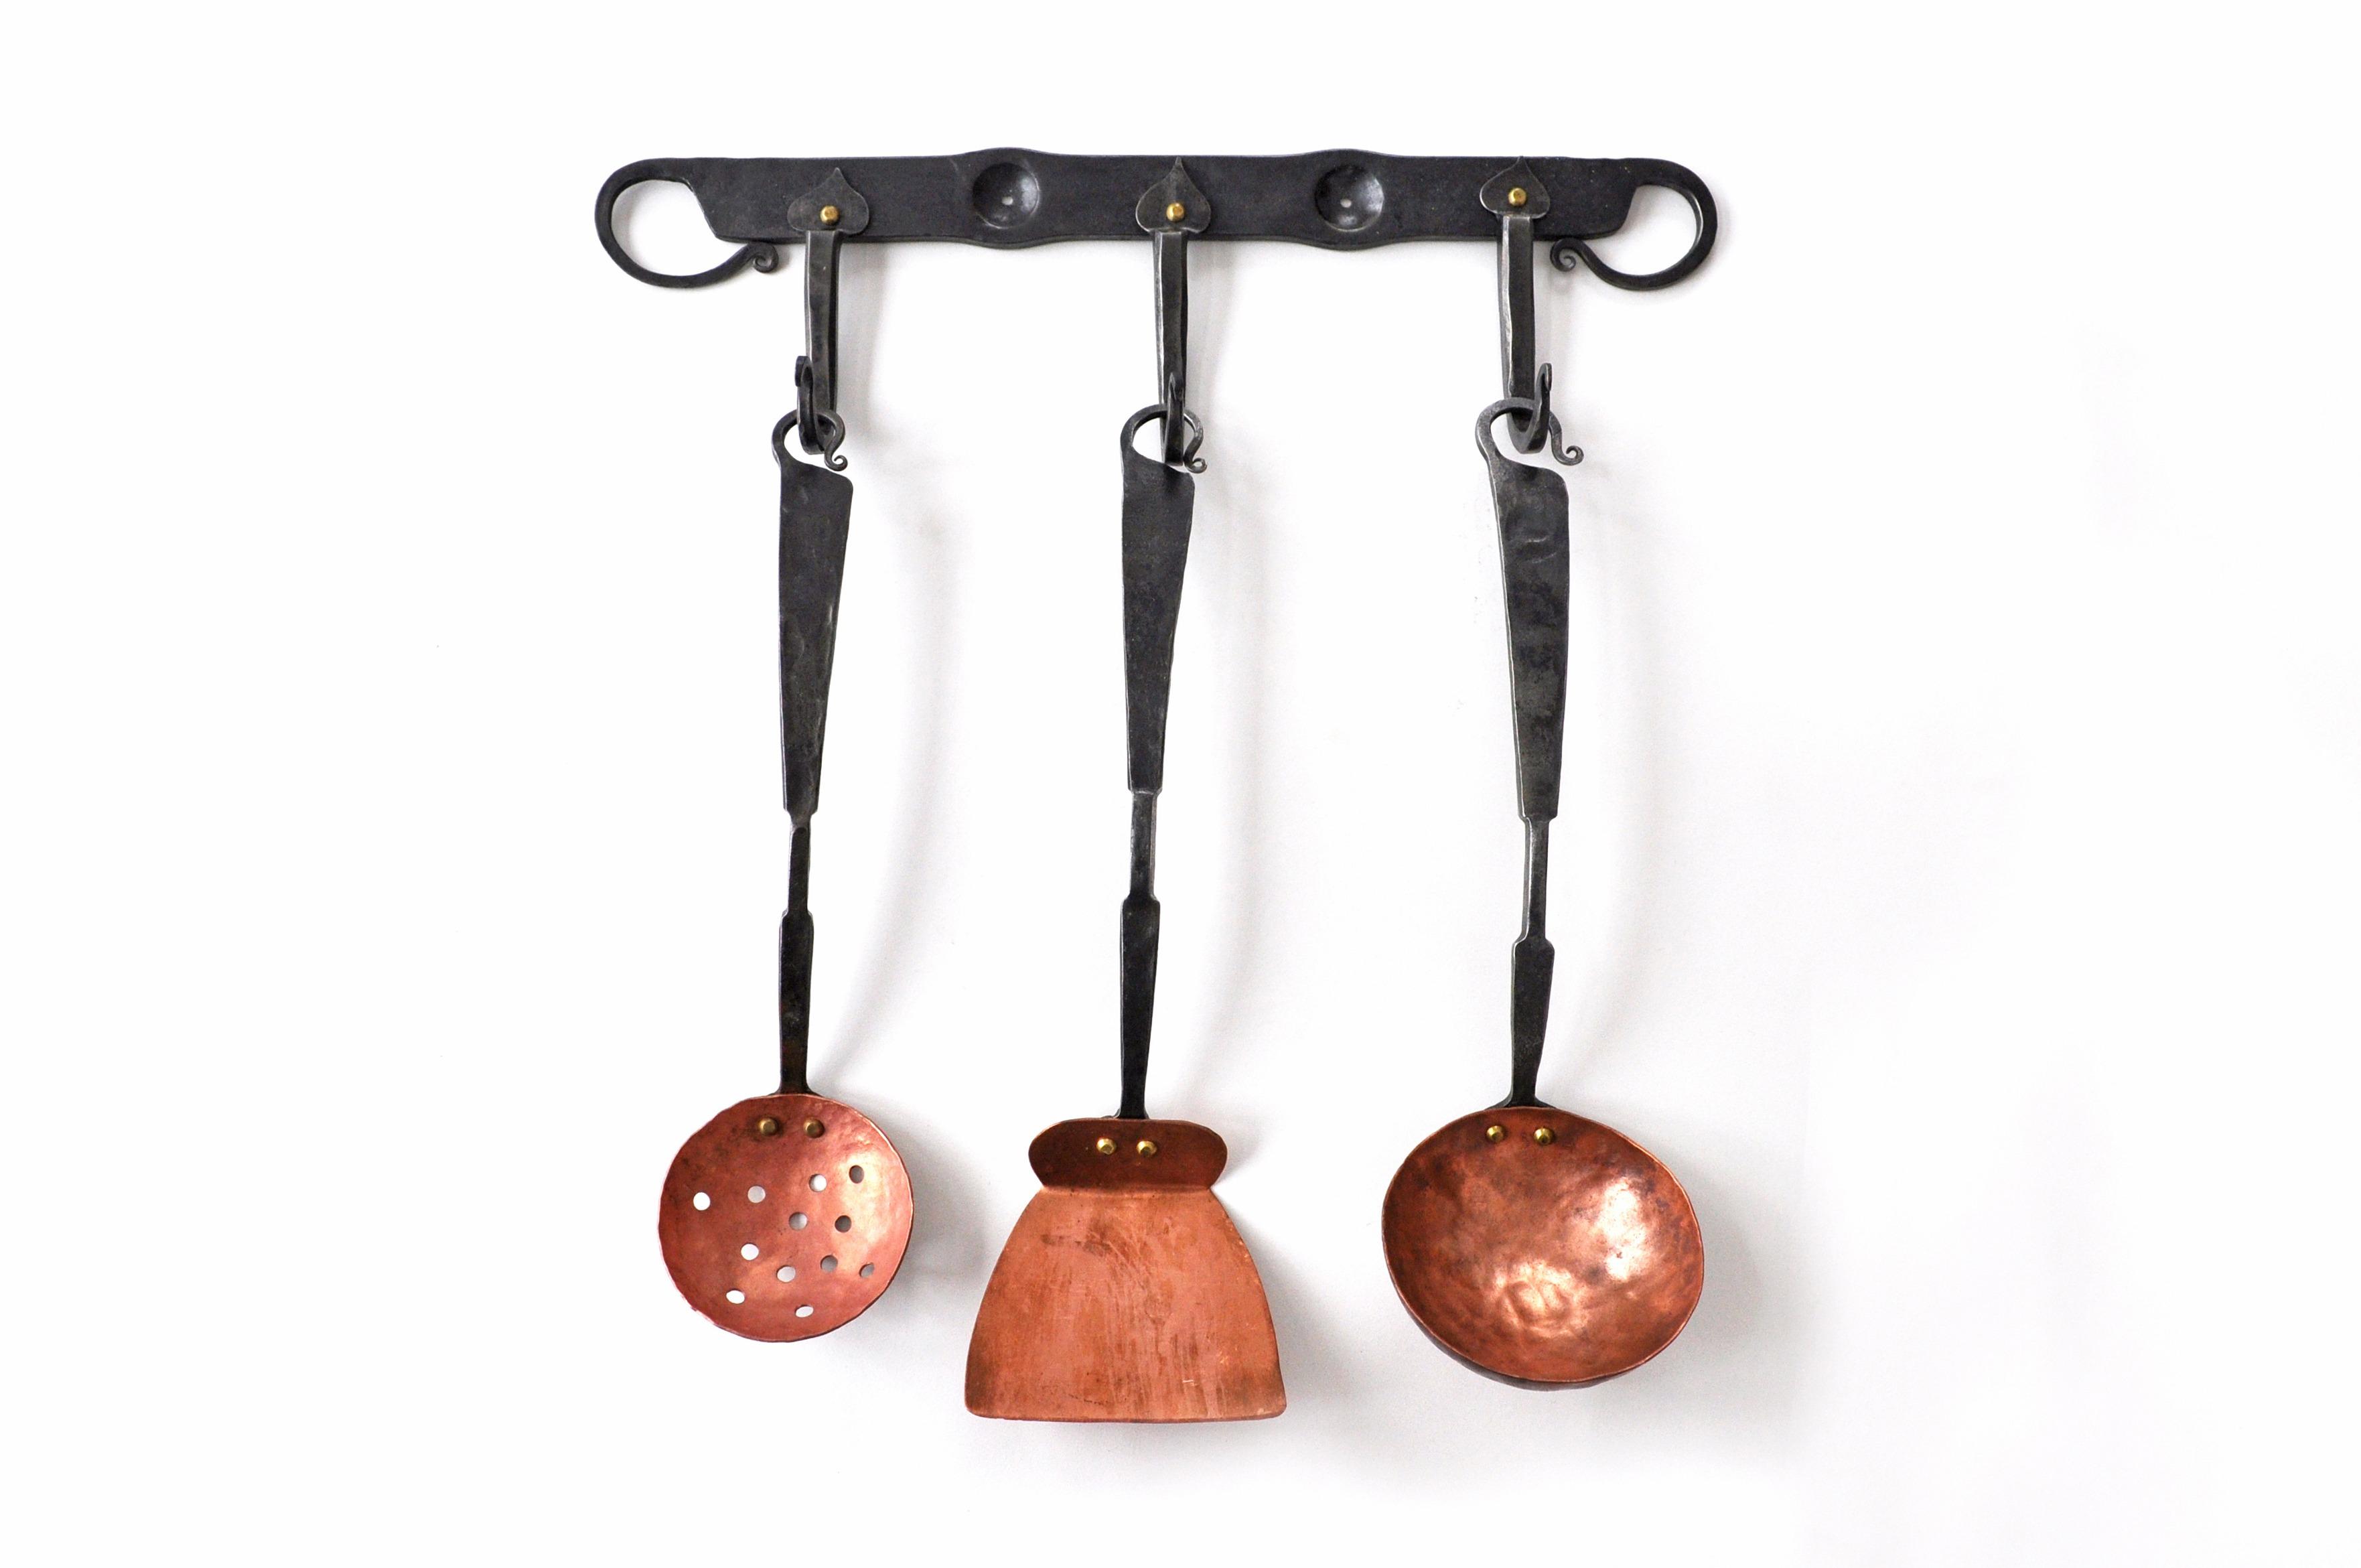 Forged Copper Serving Utensil Set